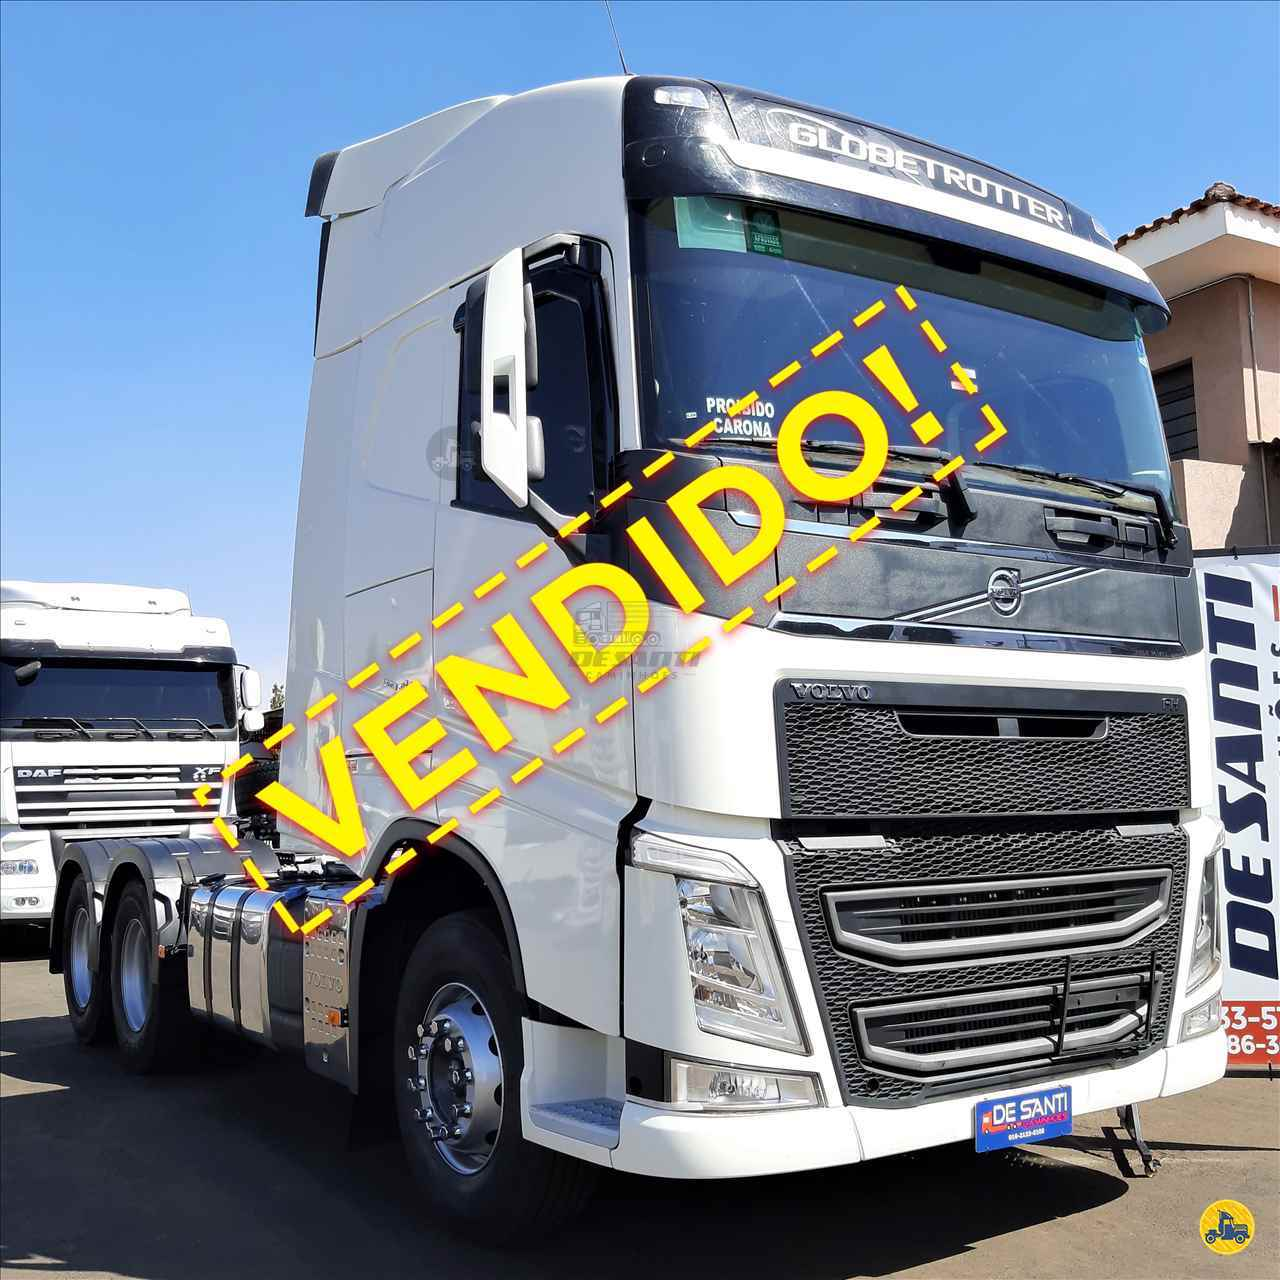 CAMINHAO VOLVO VOLVO FH 460 Cavalo Mecânico Truck 6x2 De Santi Caminhões RIBEIRAO PRETO SÃO PAULO SP